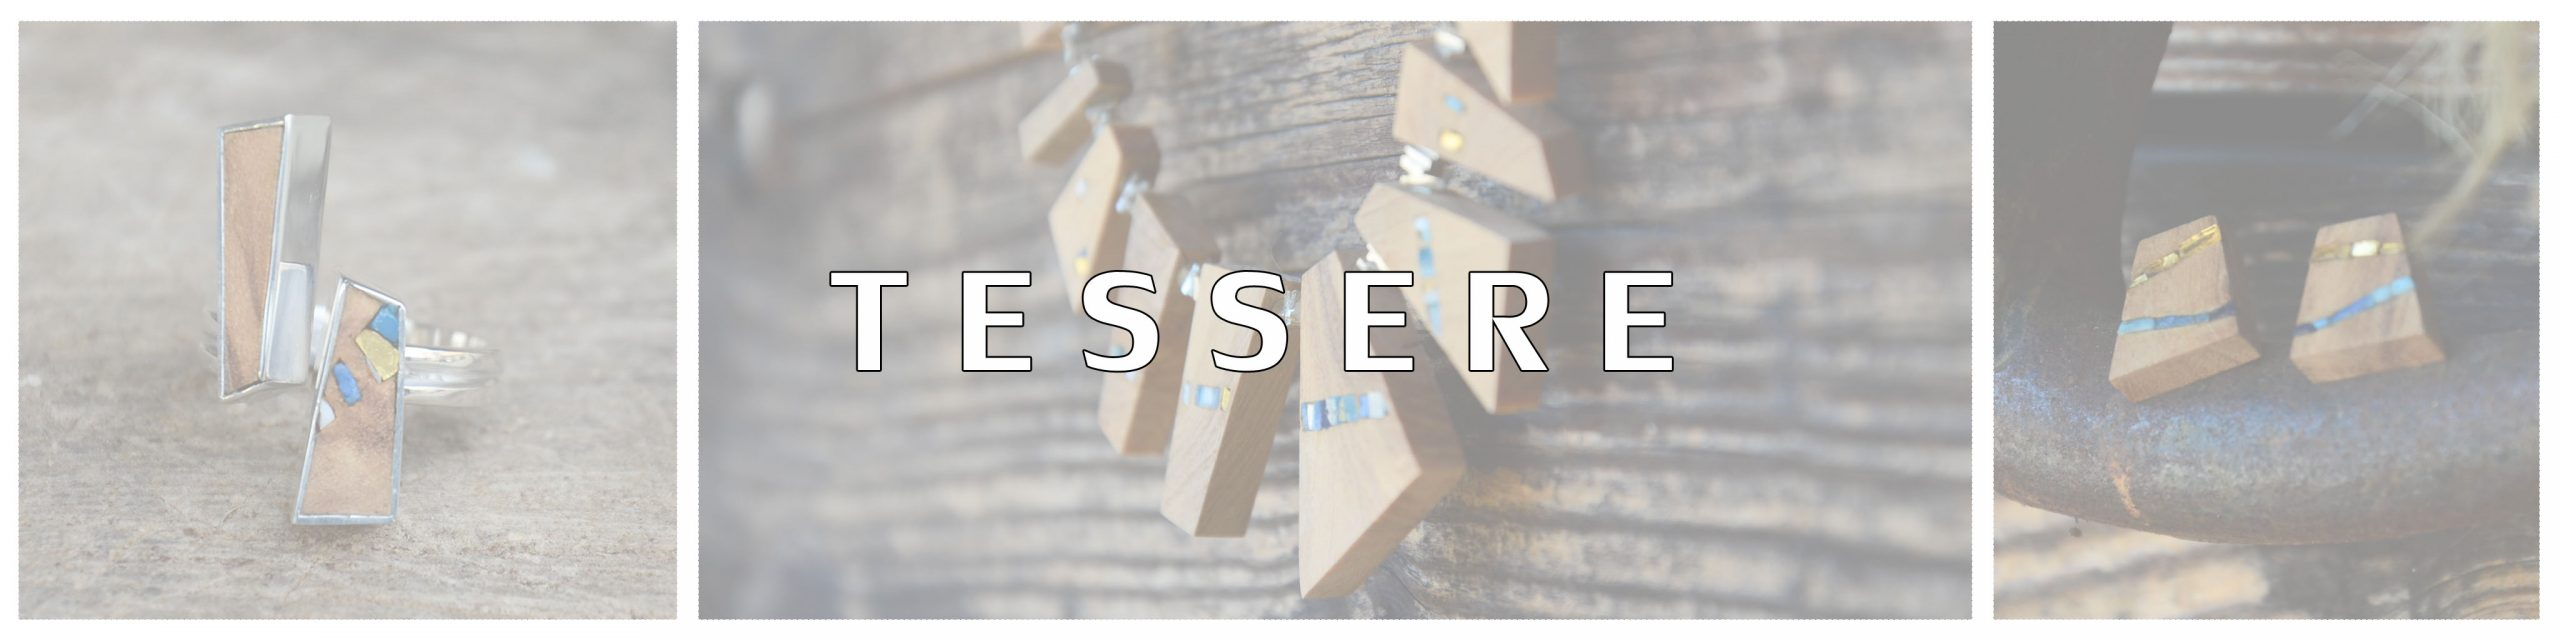 TESSERE